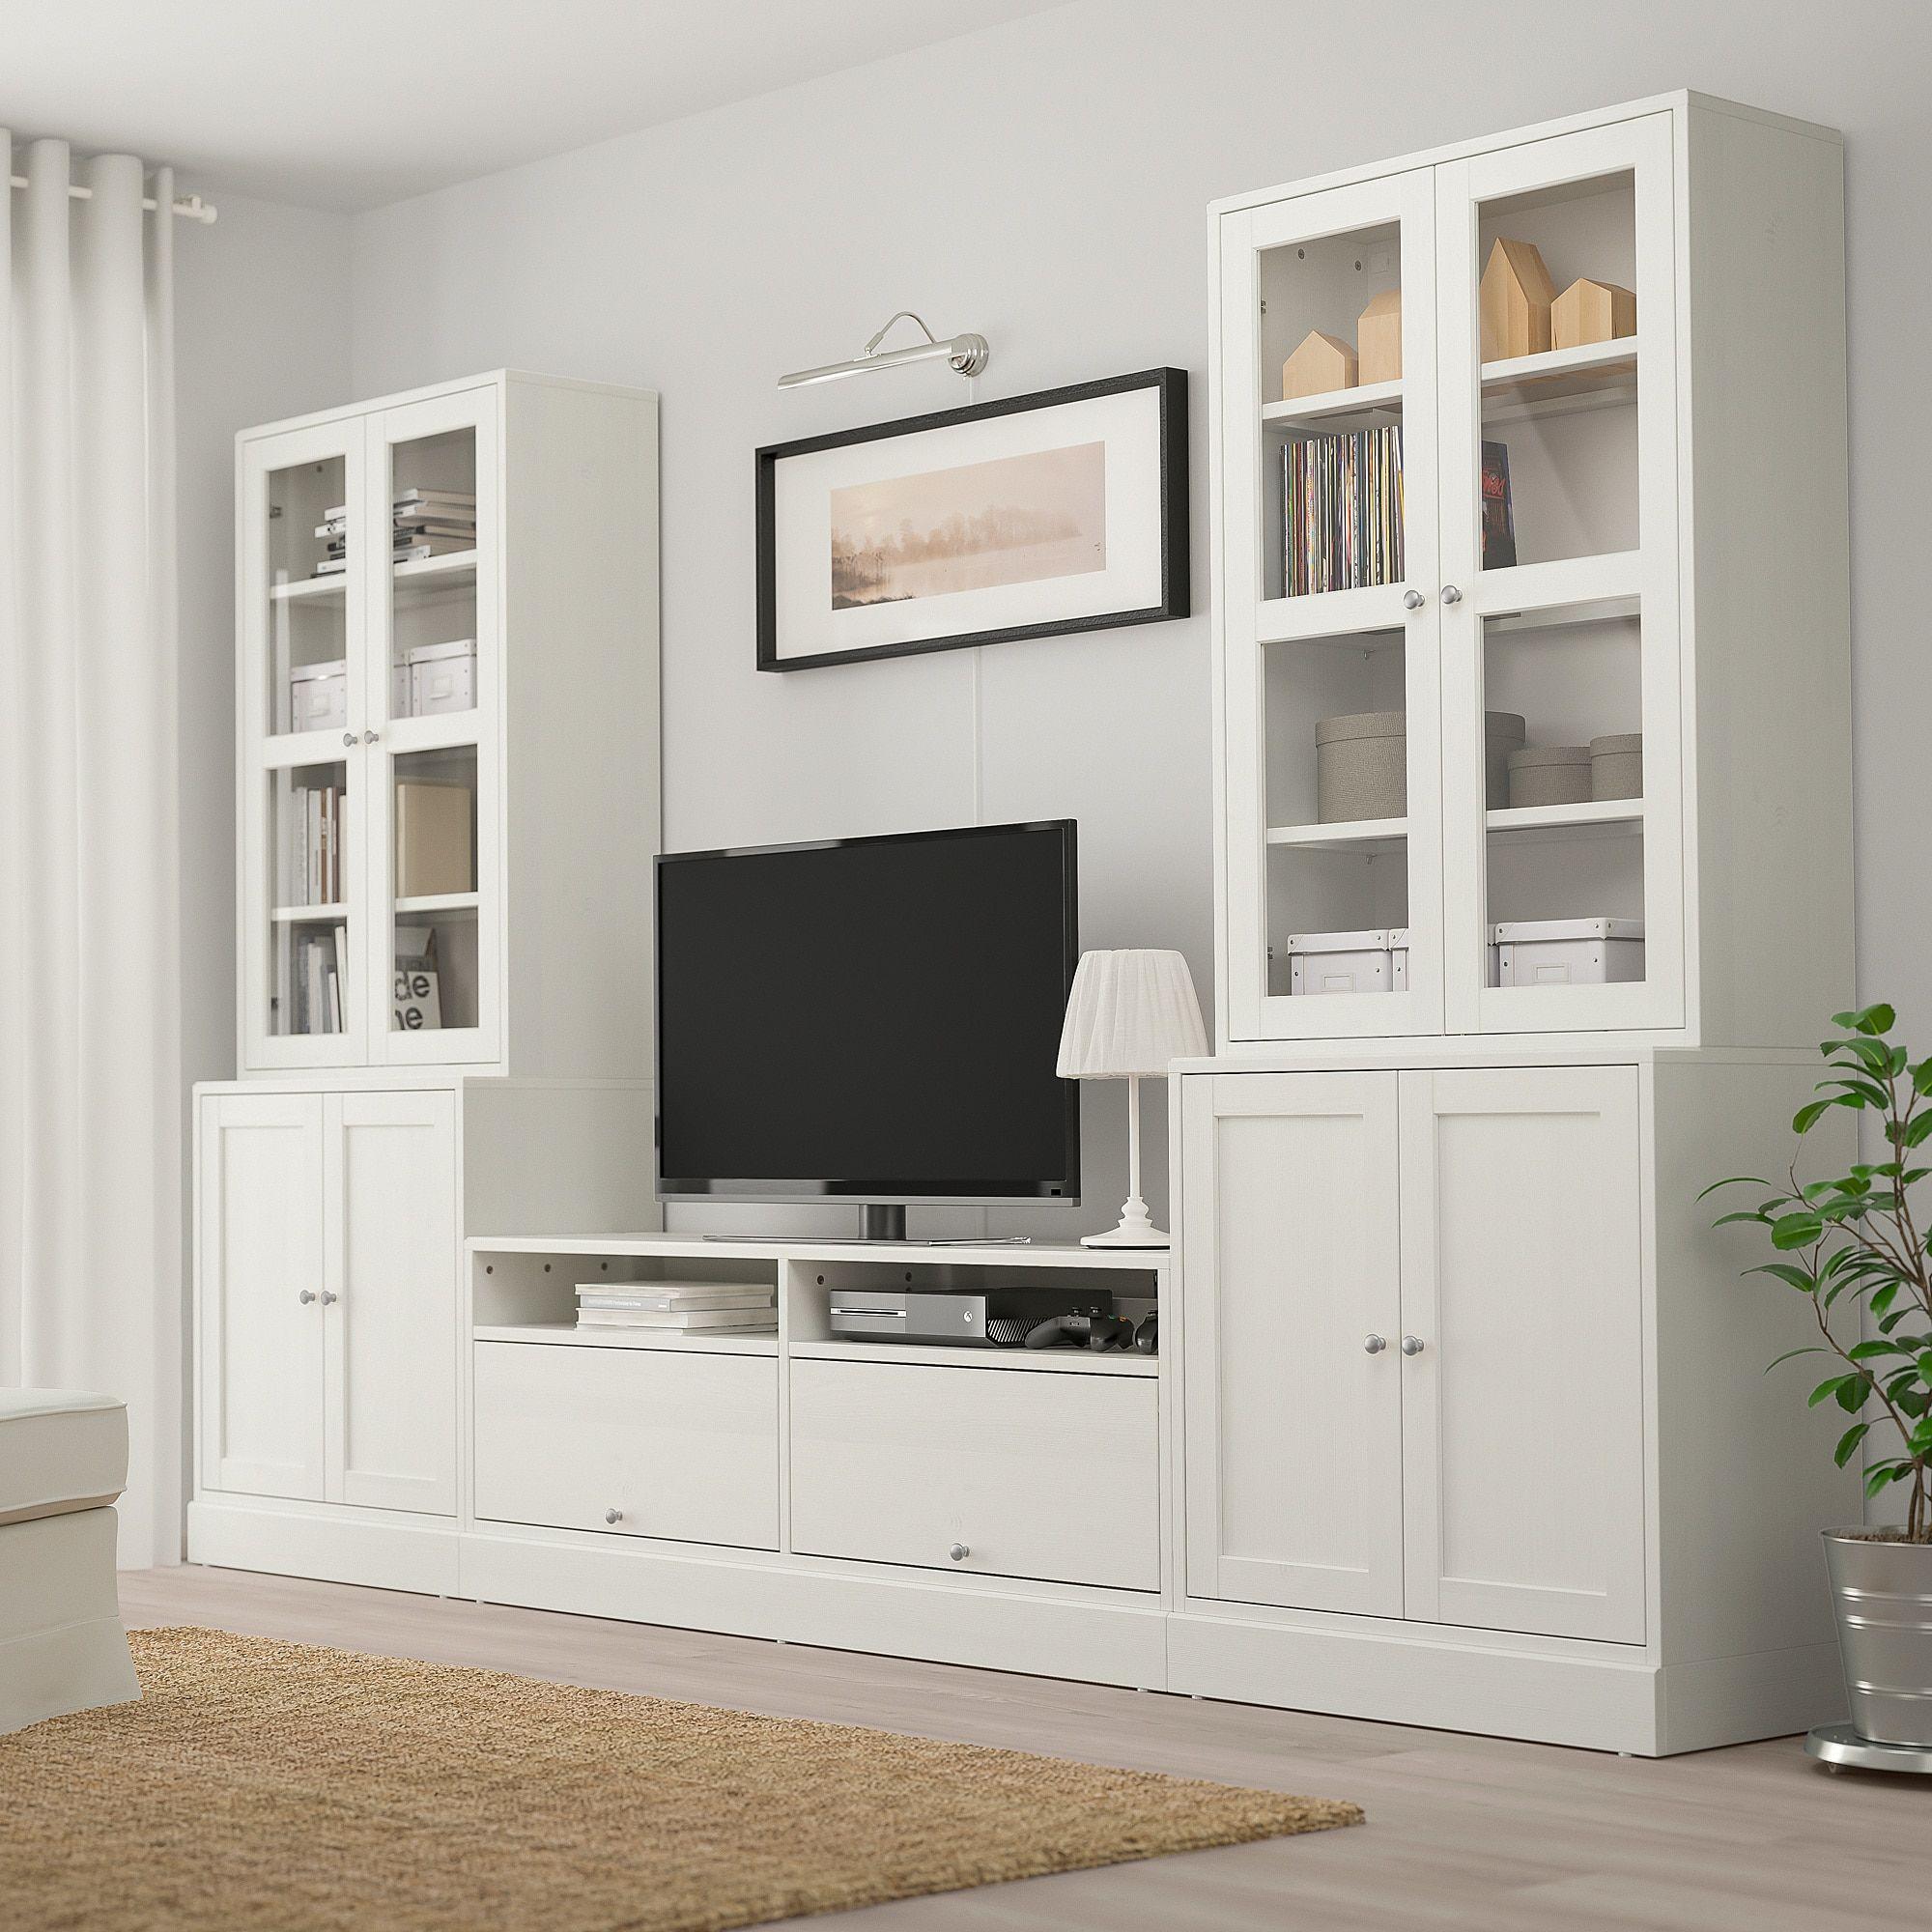 Havsta Tv Storage Combination Glass Doors White 126 3 4x18 1 2x83 1 2 Ikea Family Room Design Living Room Tv Wall Glass Cabinet Doors #white #living #room #shelf